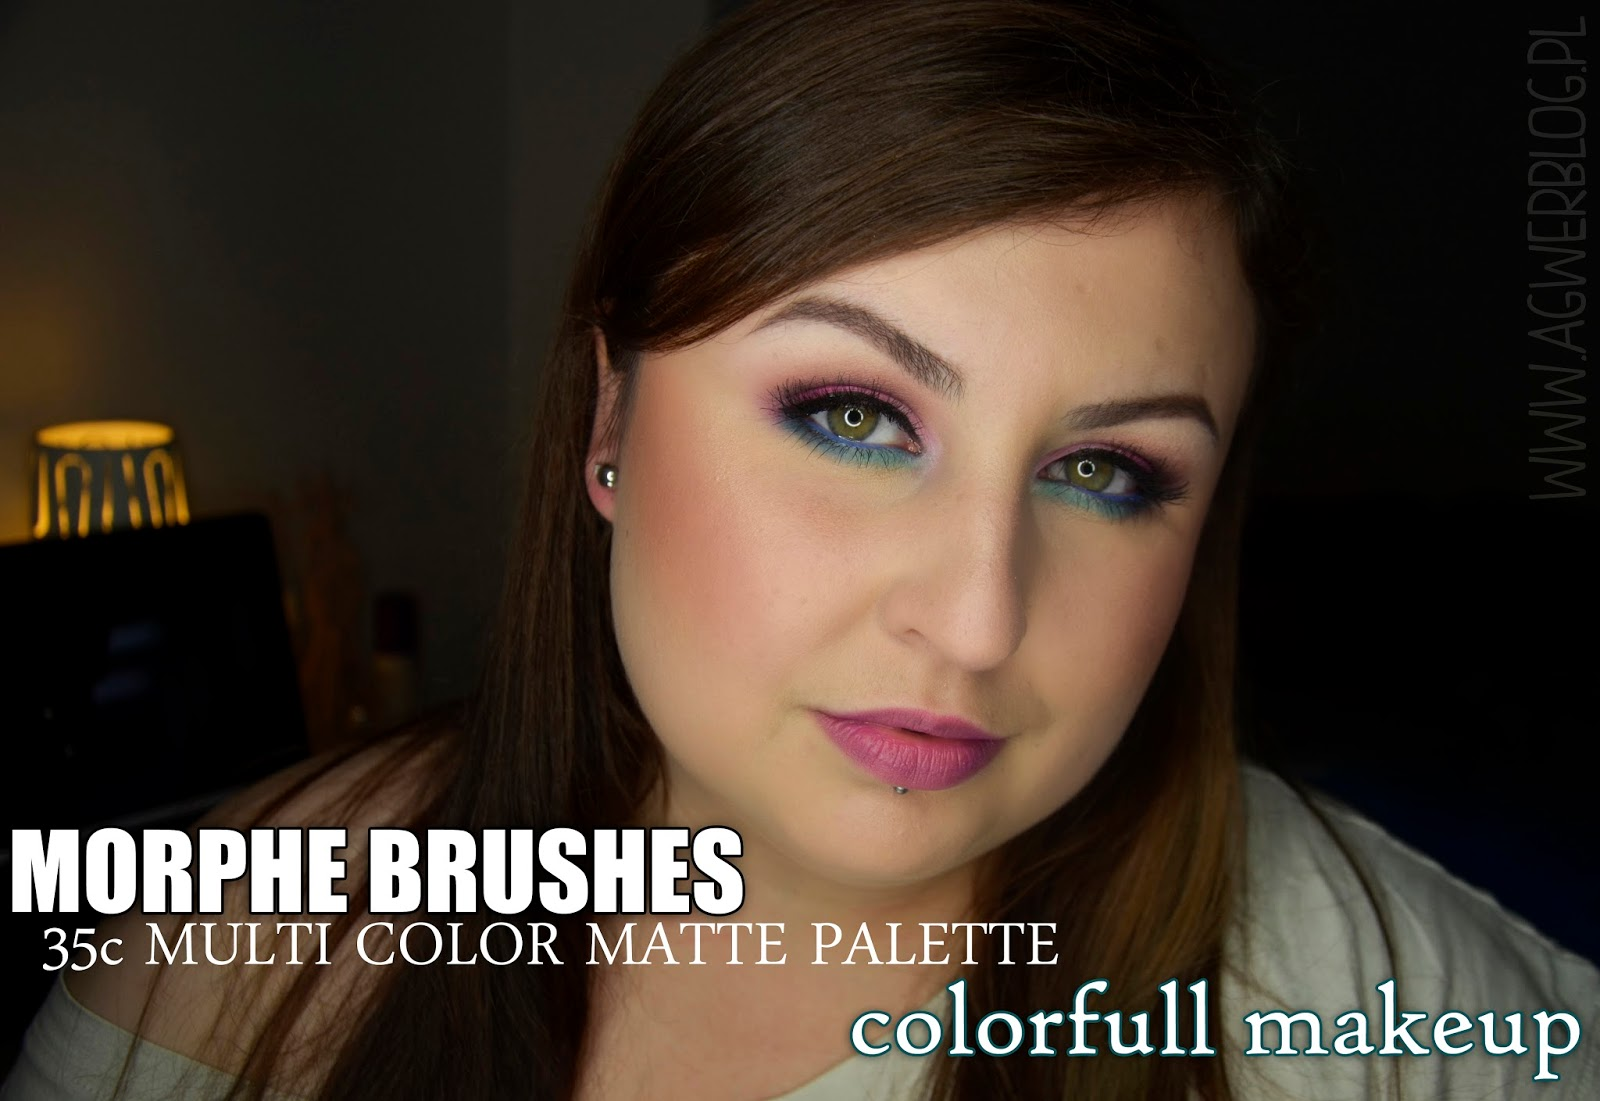 Morphe Brushes, 35c Multi color matte palette   colorfull makeup